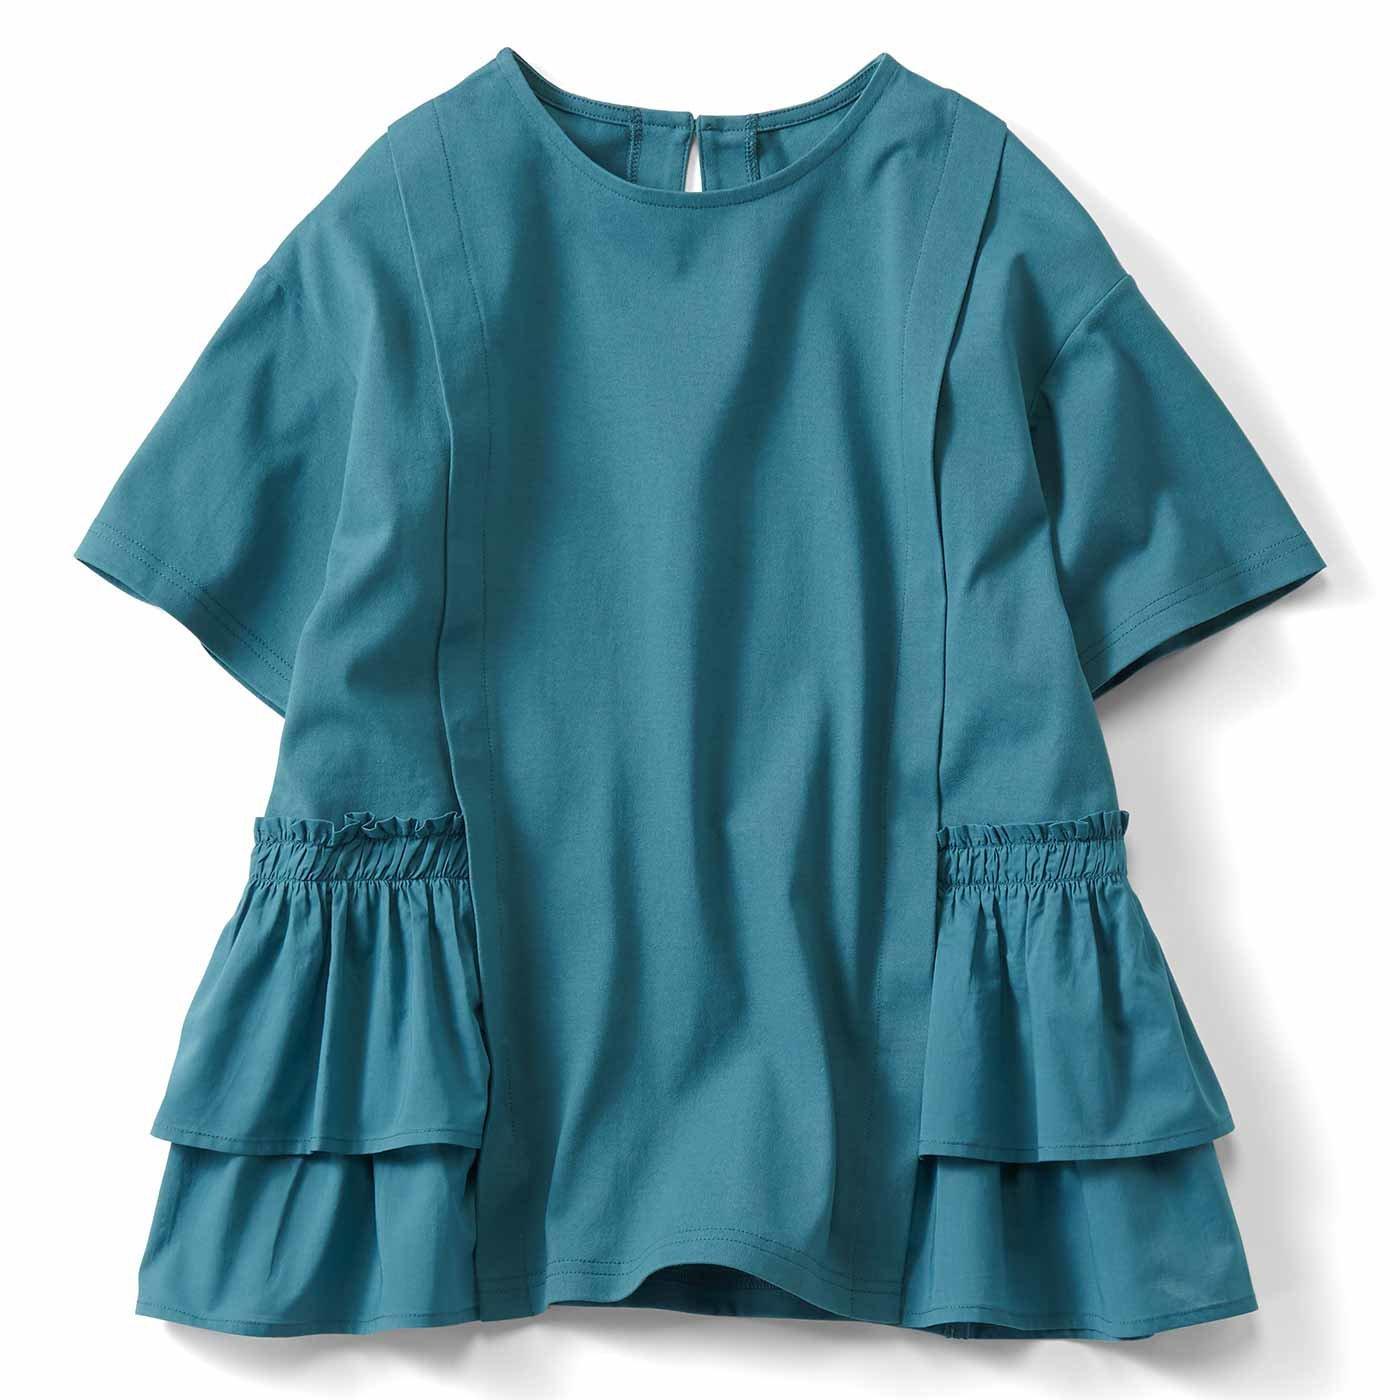 IEDIT[イディット] 汗じみ軽減加工をほどこした異素材遣いTシャツ〈グリーン〉